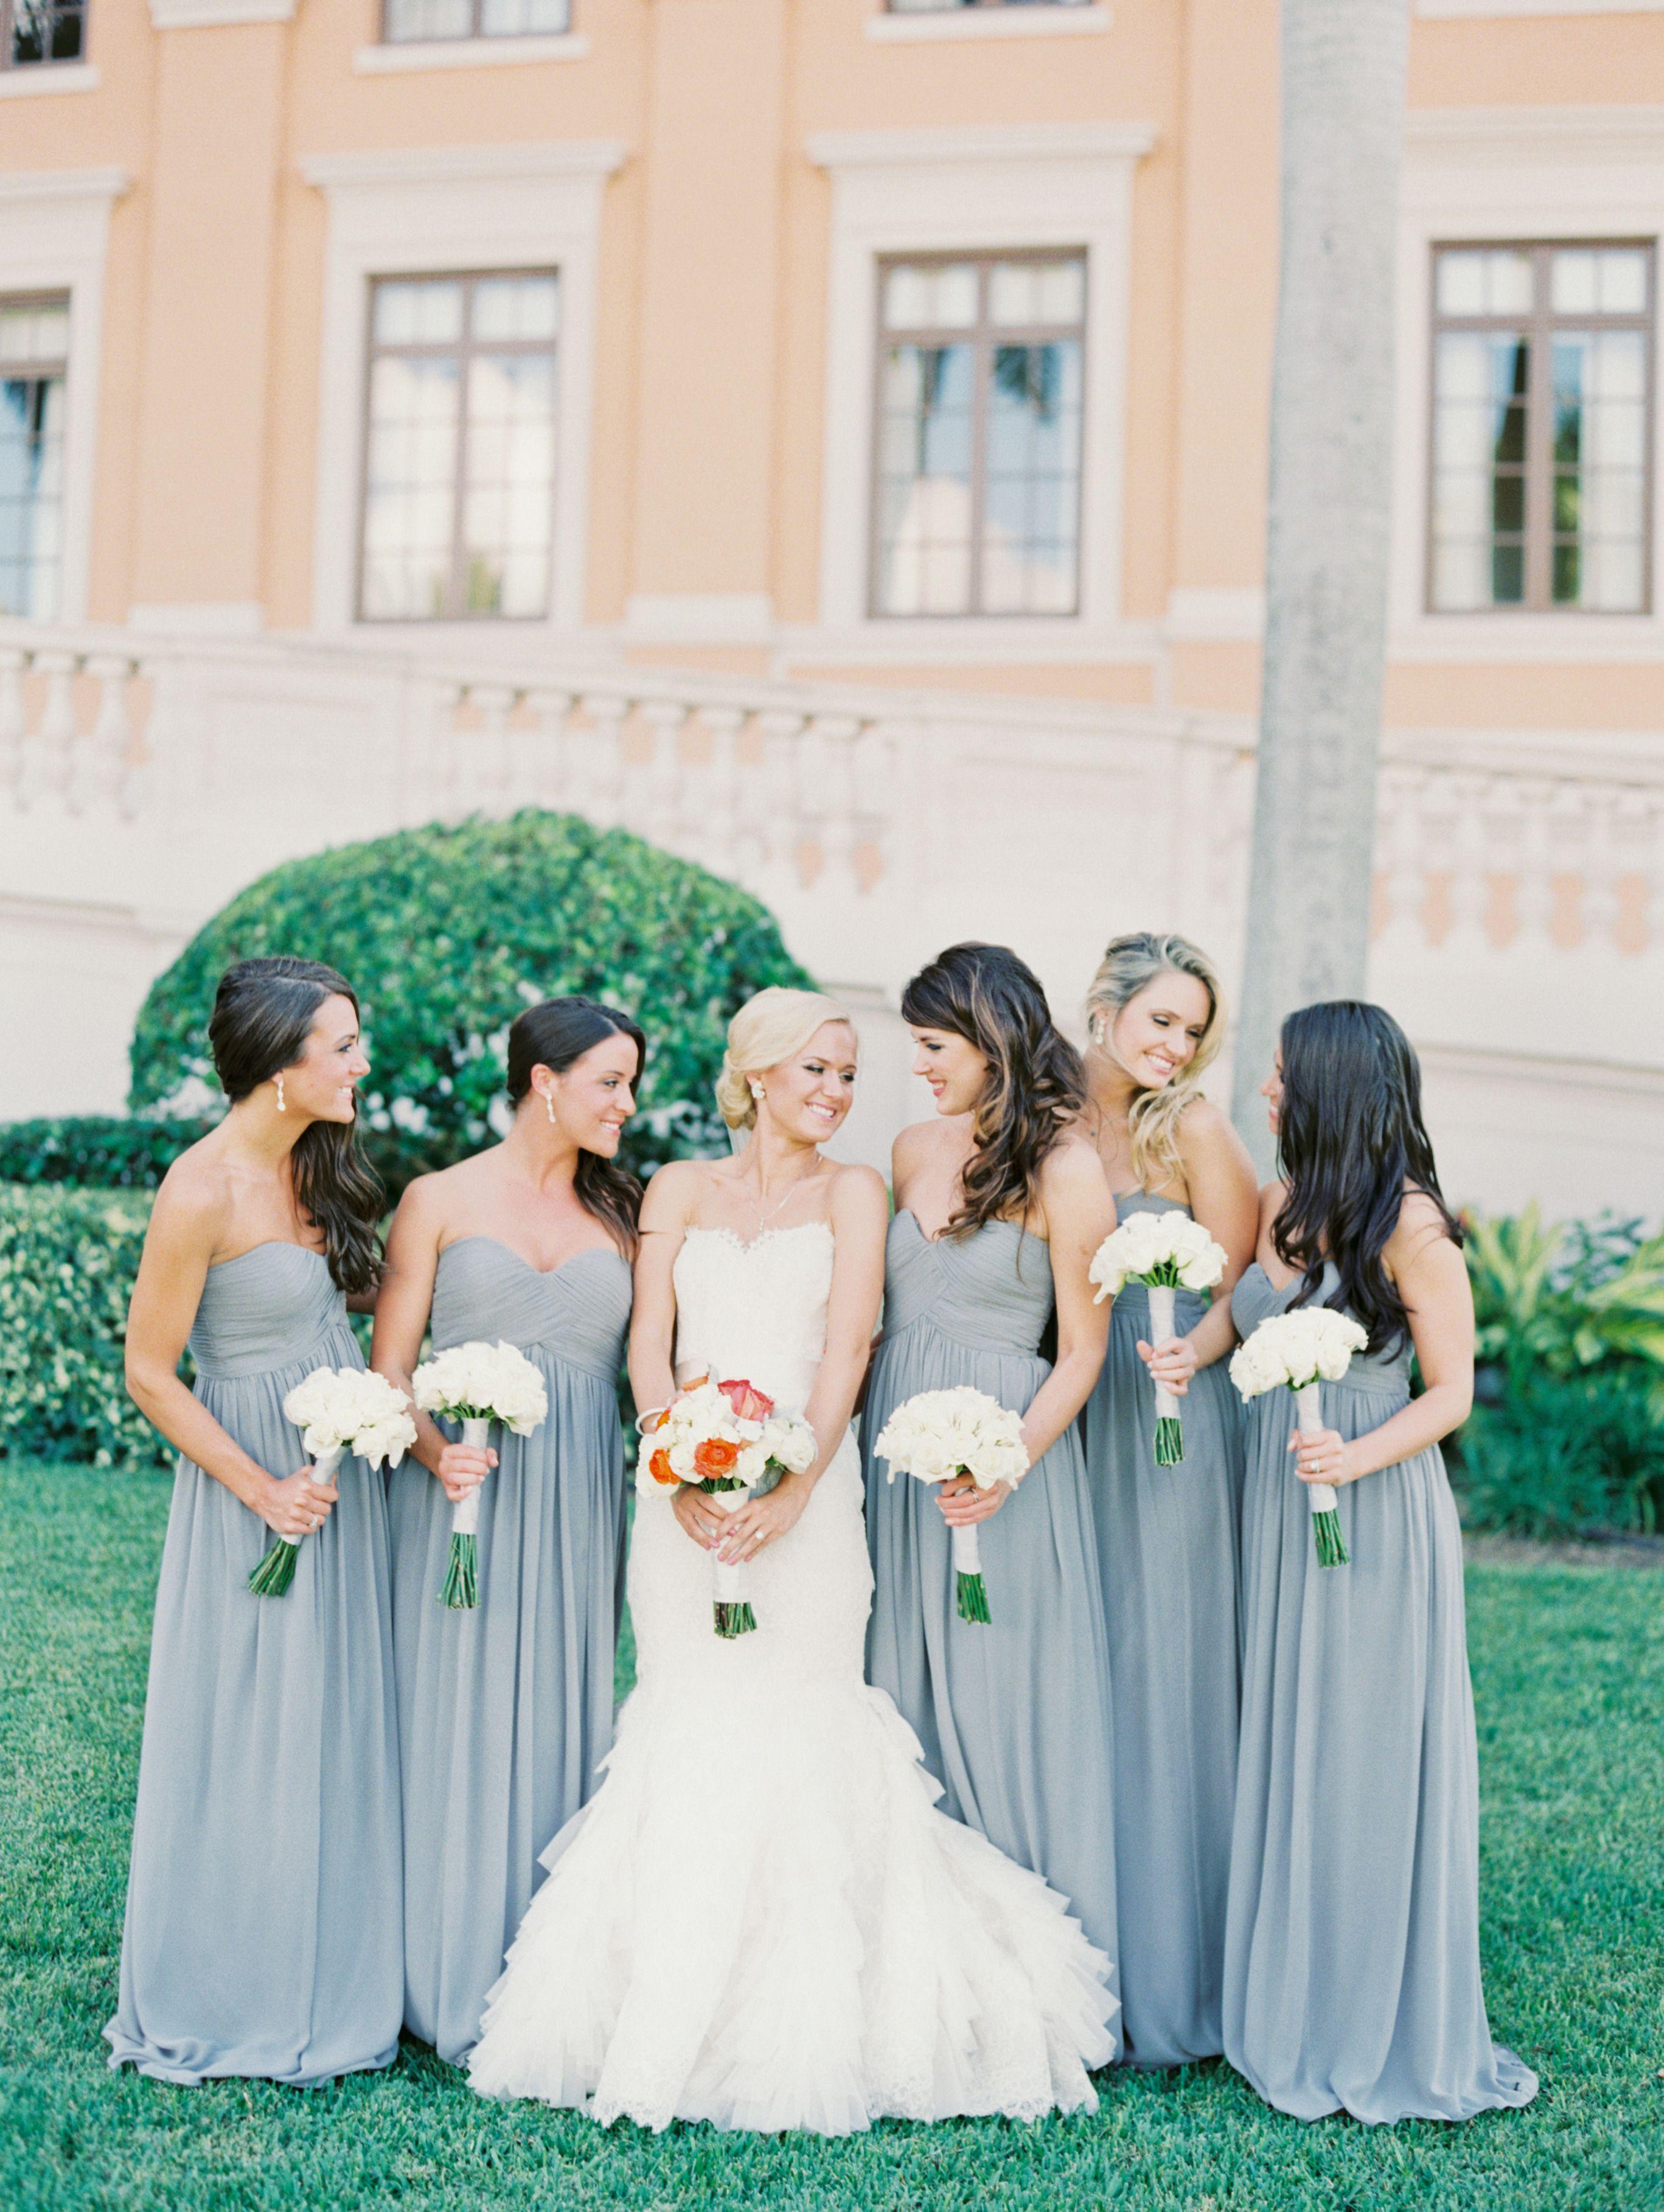 Biltmore Hotel Wedding by Michelle March | Donna morgan, Hotel ...